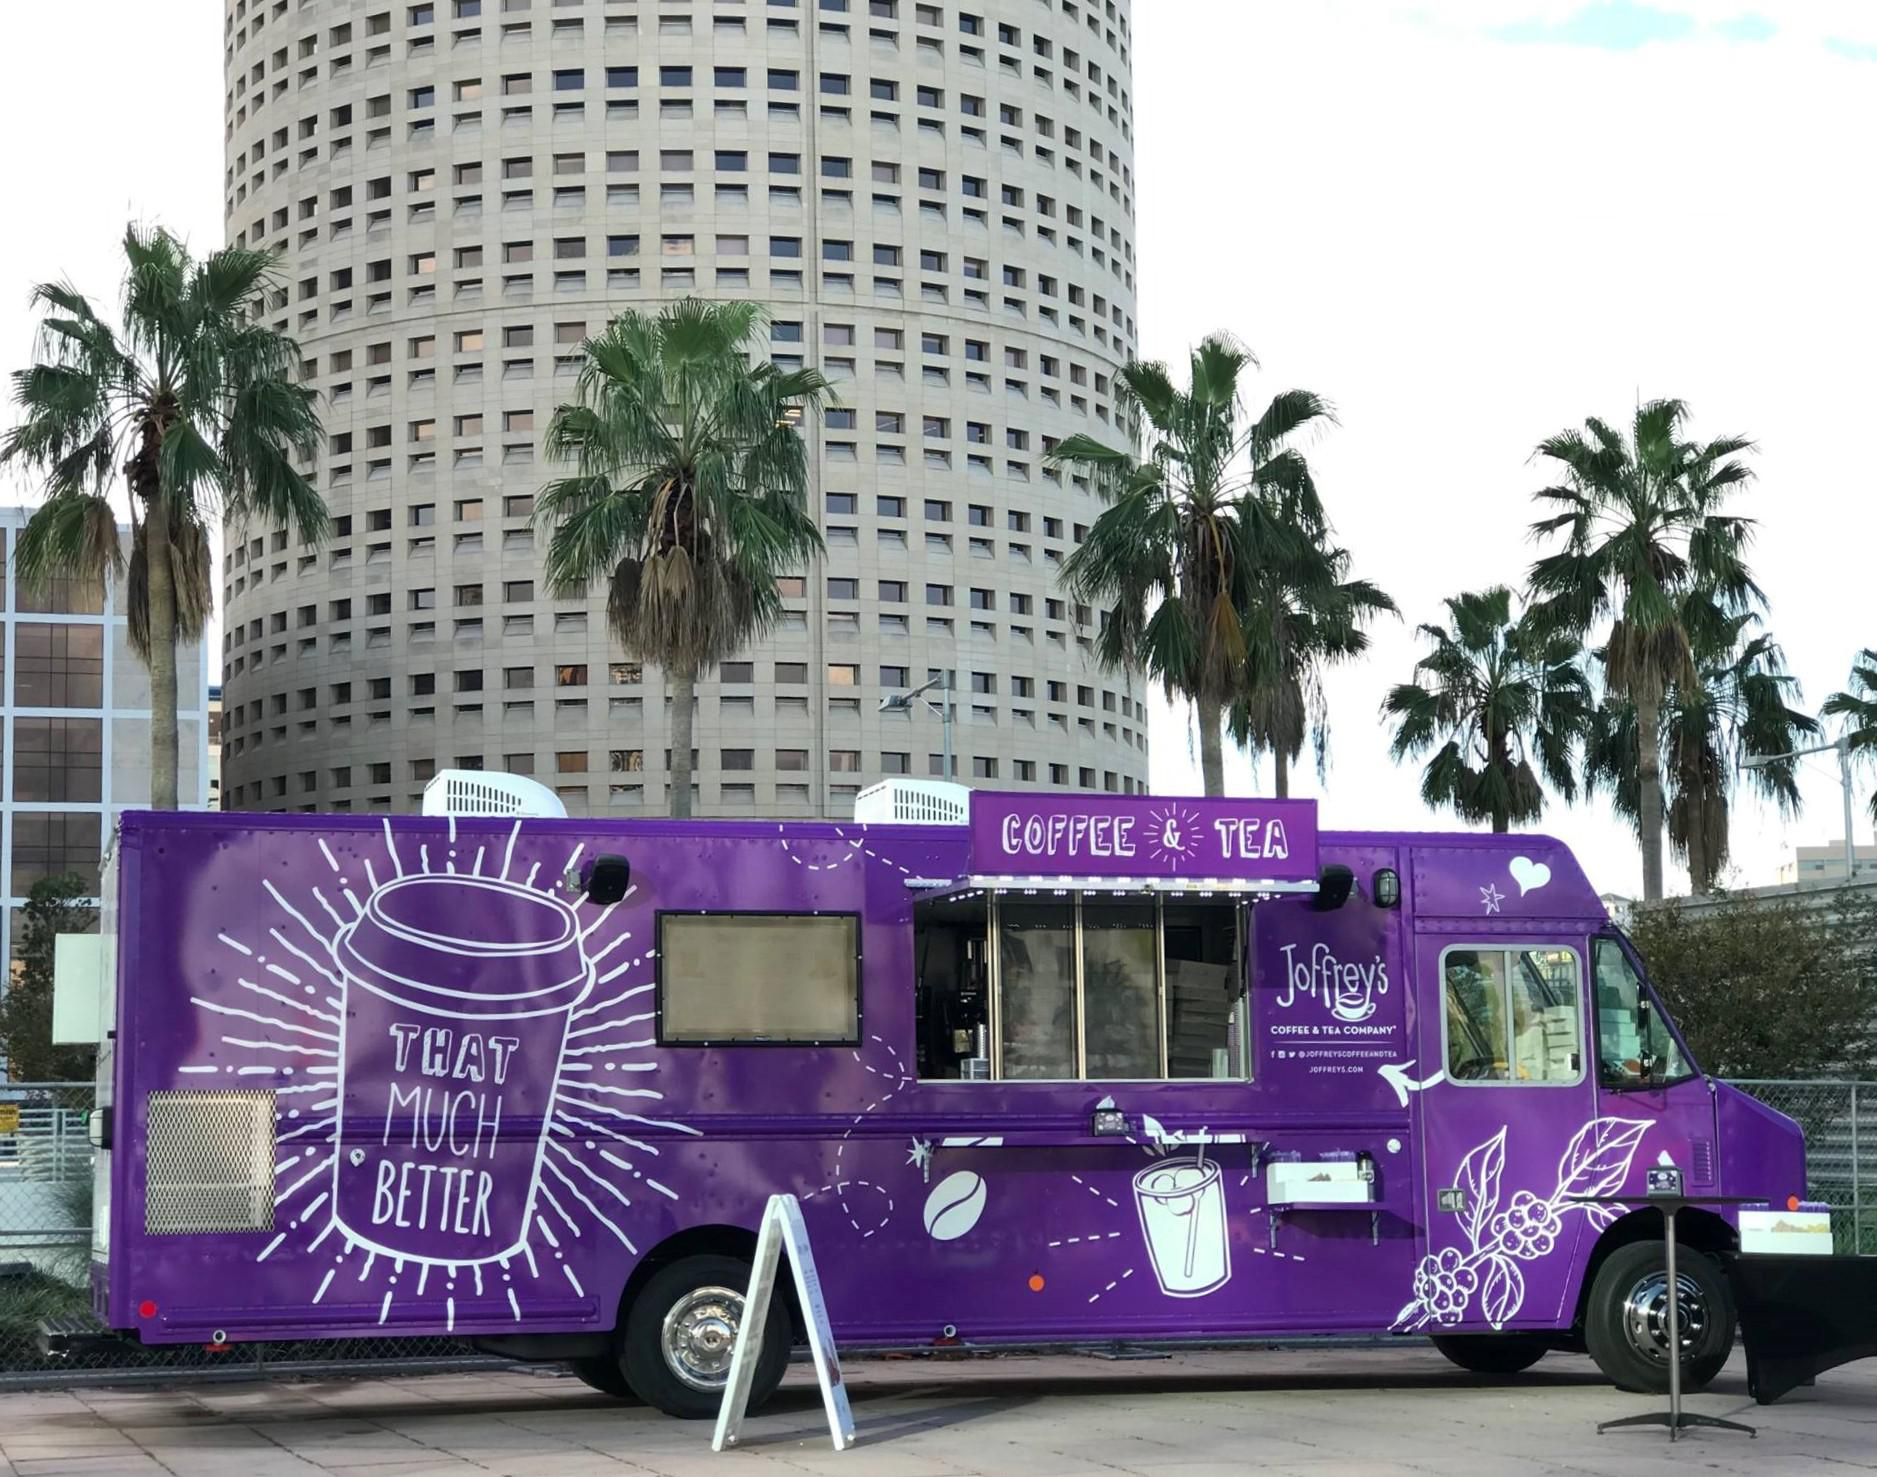 Preferred Design an impressive, mouth-watering food truck menu board - The  WD92